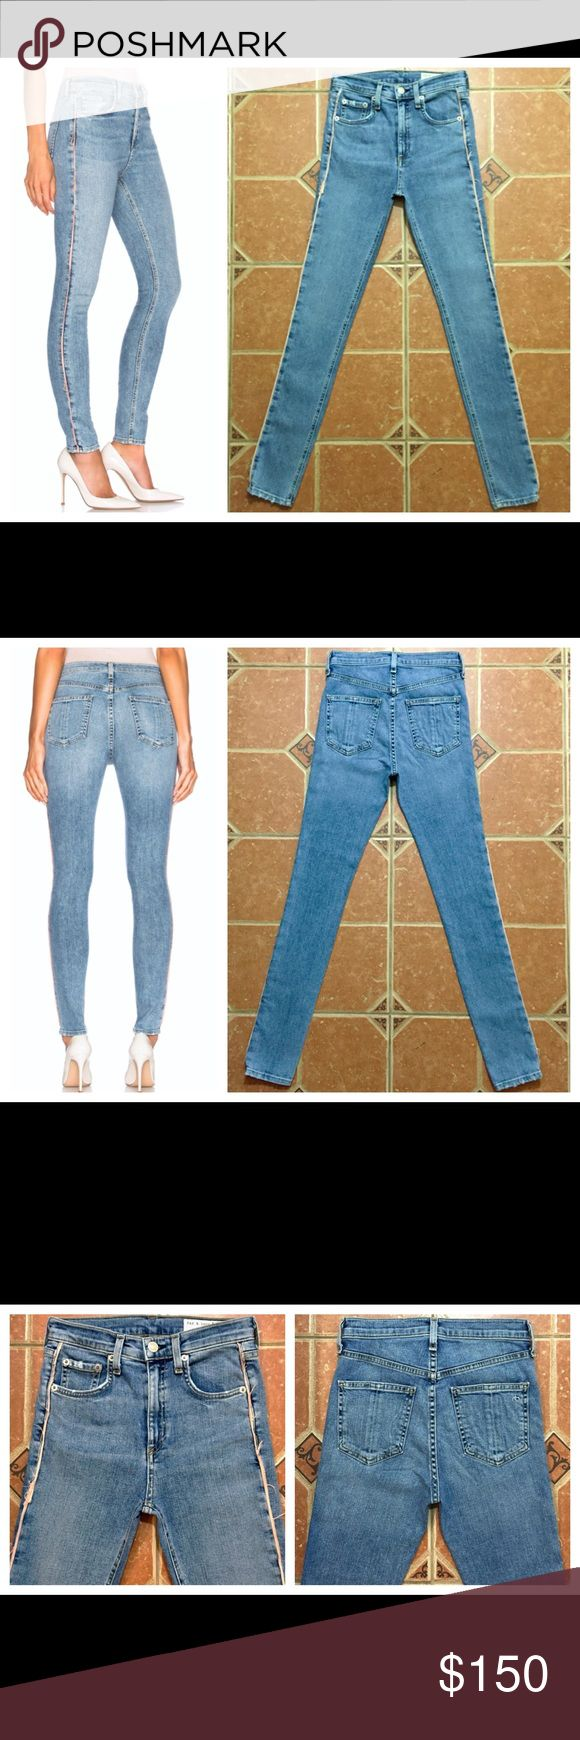 "RAG & BONE High Rise Skinny Jeans $250 RAG & BONE High Rise Skinny Jeans Frayed Side Edges Size 24 x 30  MEASUREMENTS: ACROSS WAIST: 12"" RISE: 10"" INSEAM: 30"" ACROSS LEG OPENING: 4.5"" rag & bone Jeans Skinny"